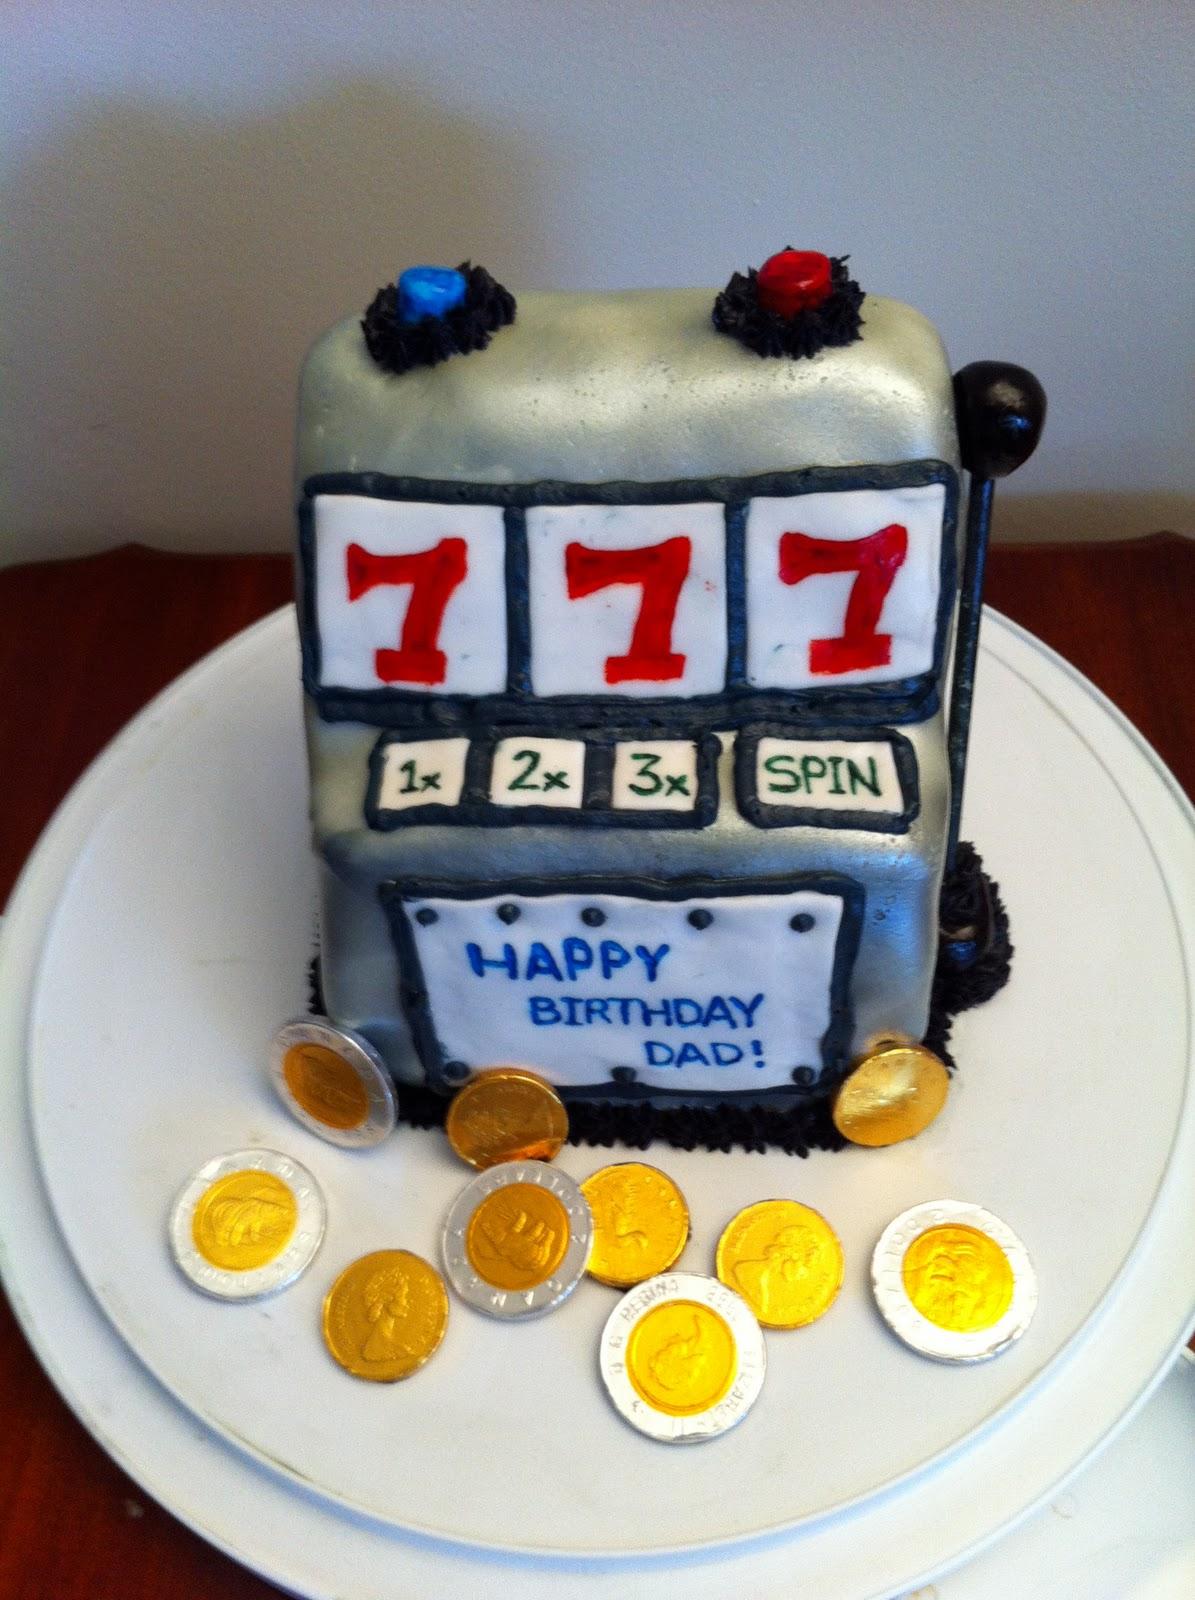 Slot Machine Cakes 008 How To Pick A Winning Slot Machine 6 0